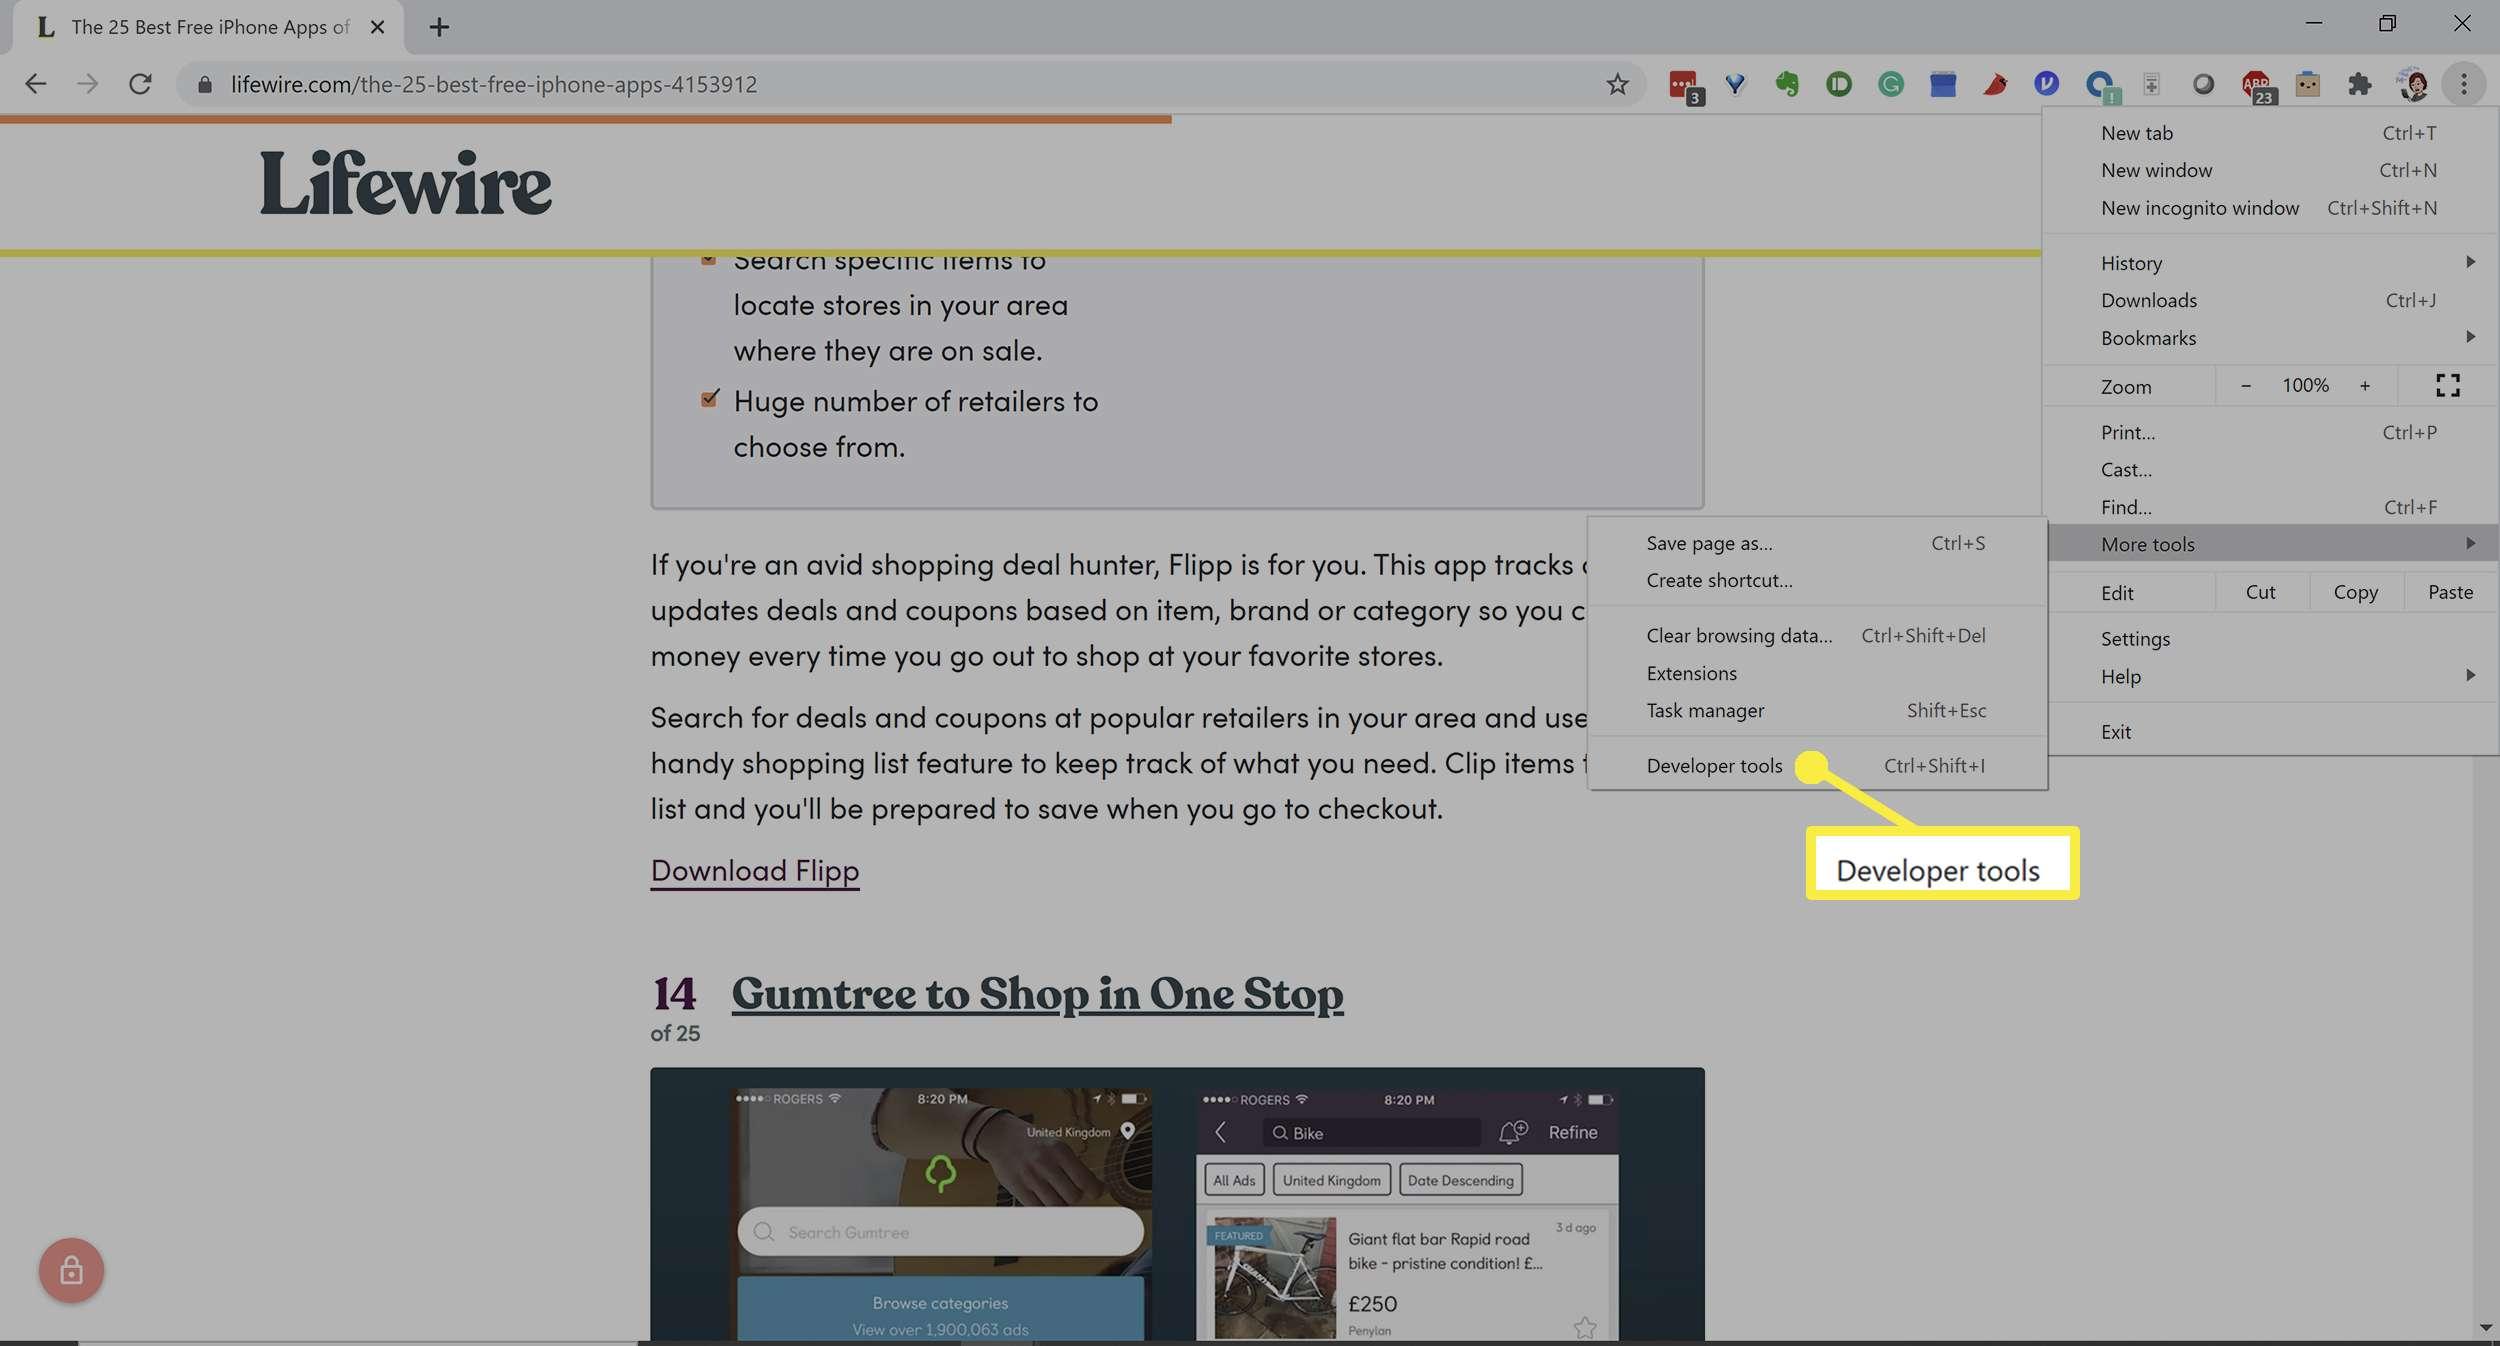 Chrome's screenshot options in developer tools.